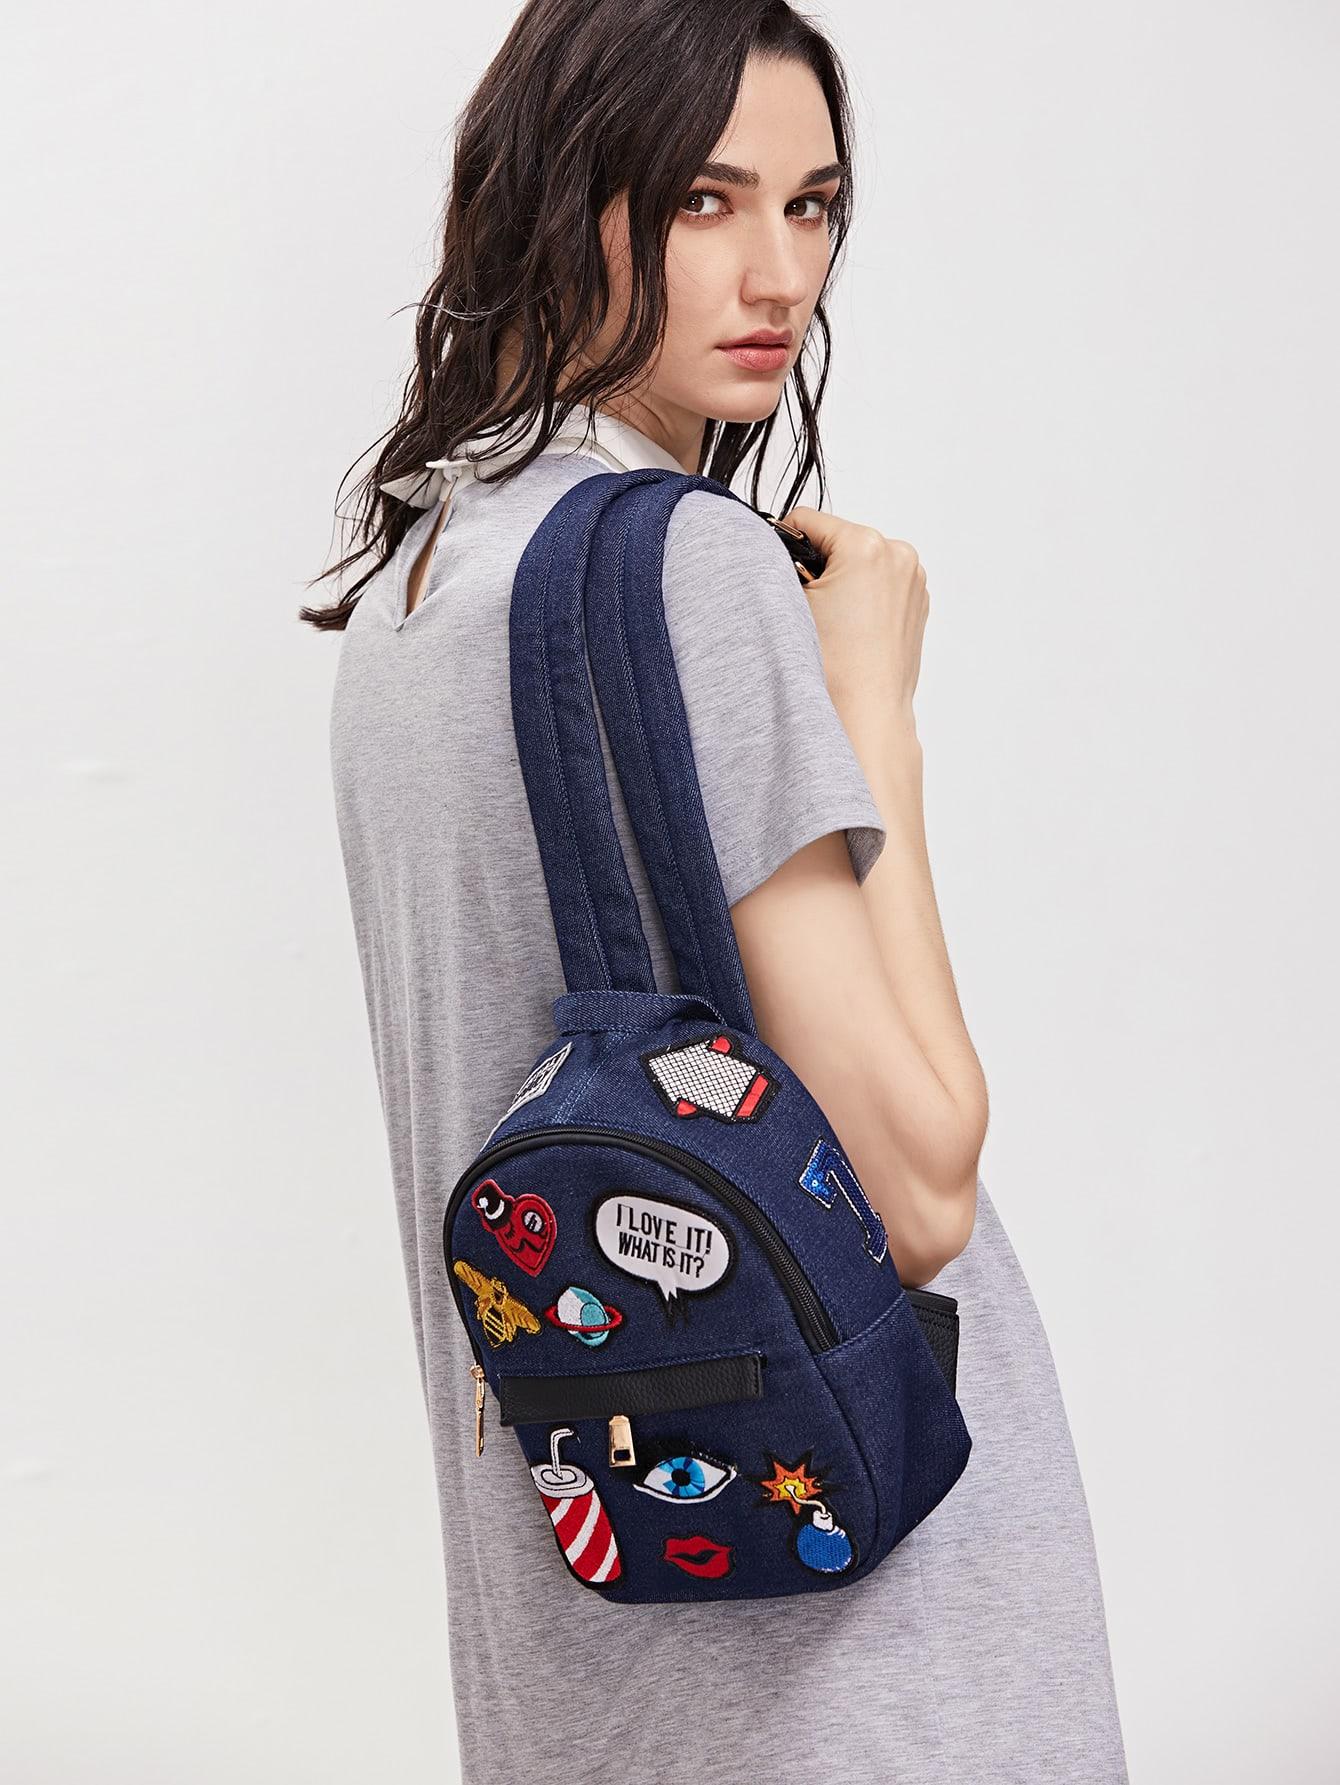 bag161230903_2